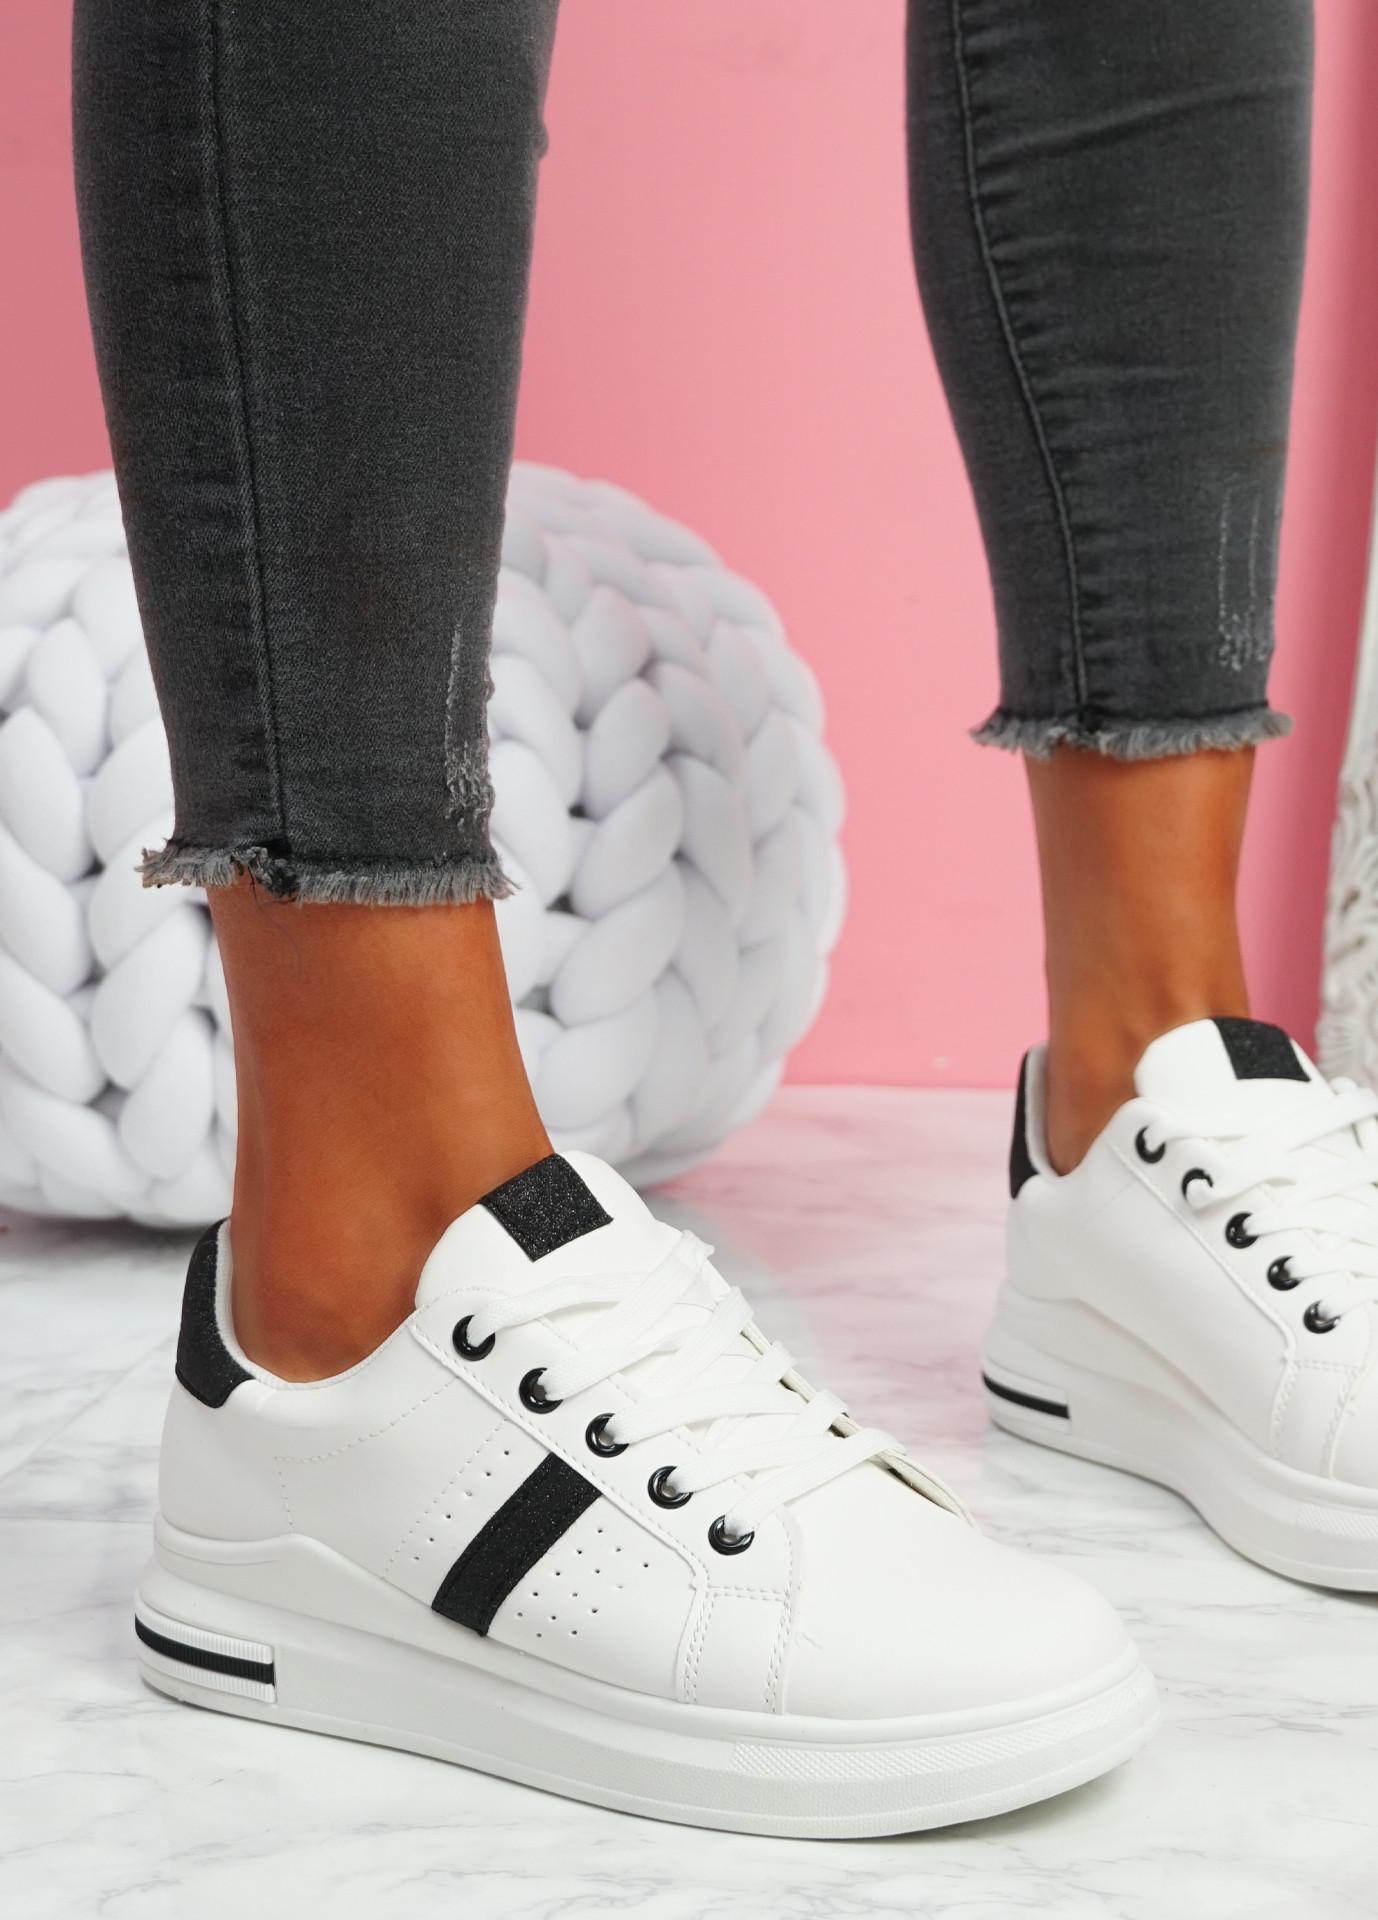 Juwe White Black Platform Glitter Trainers